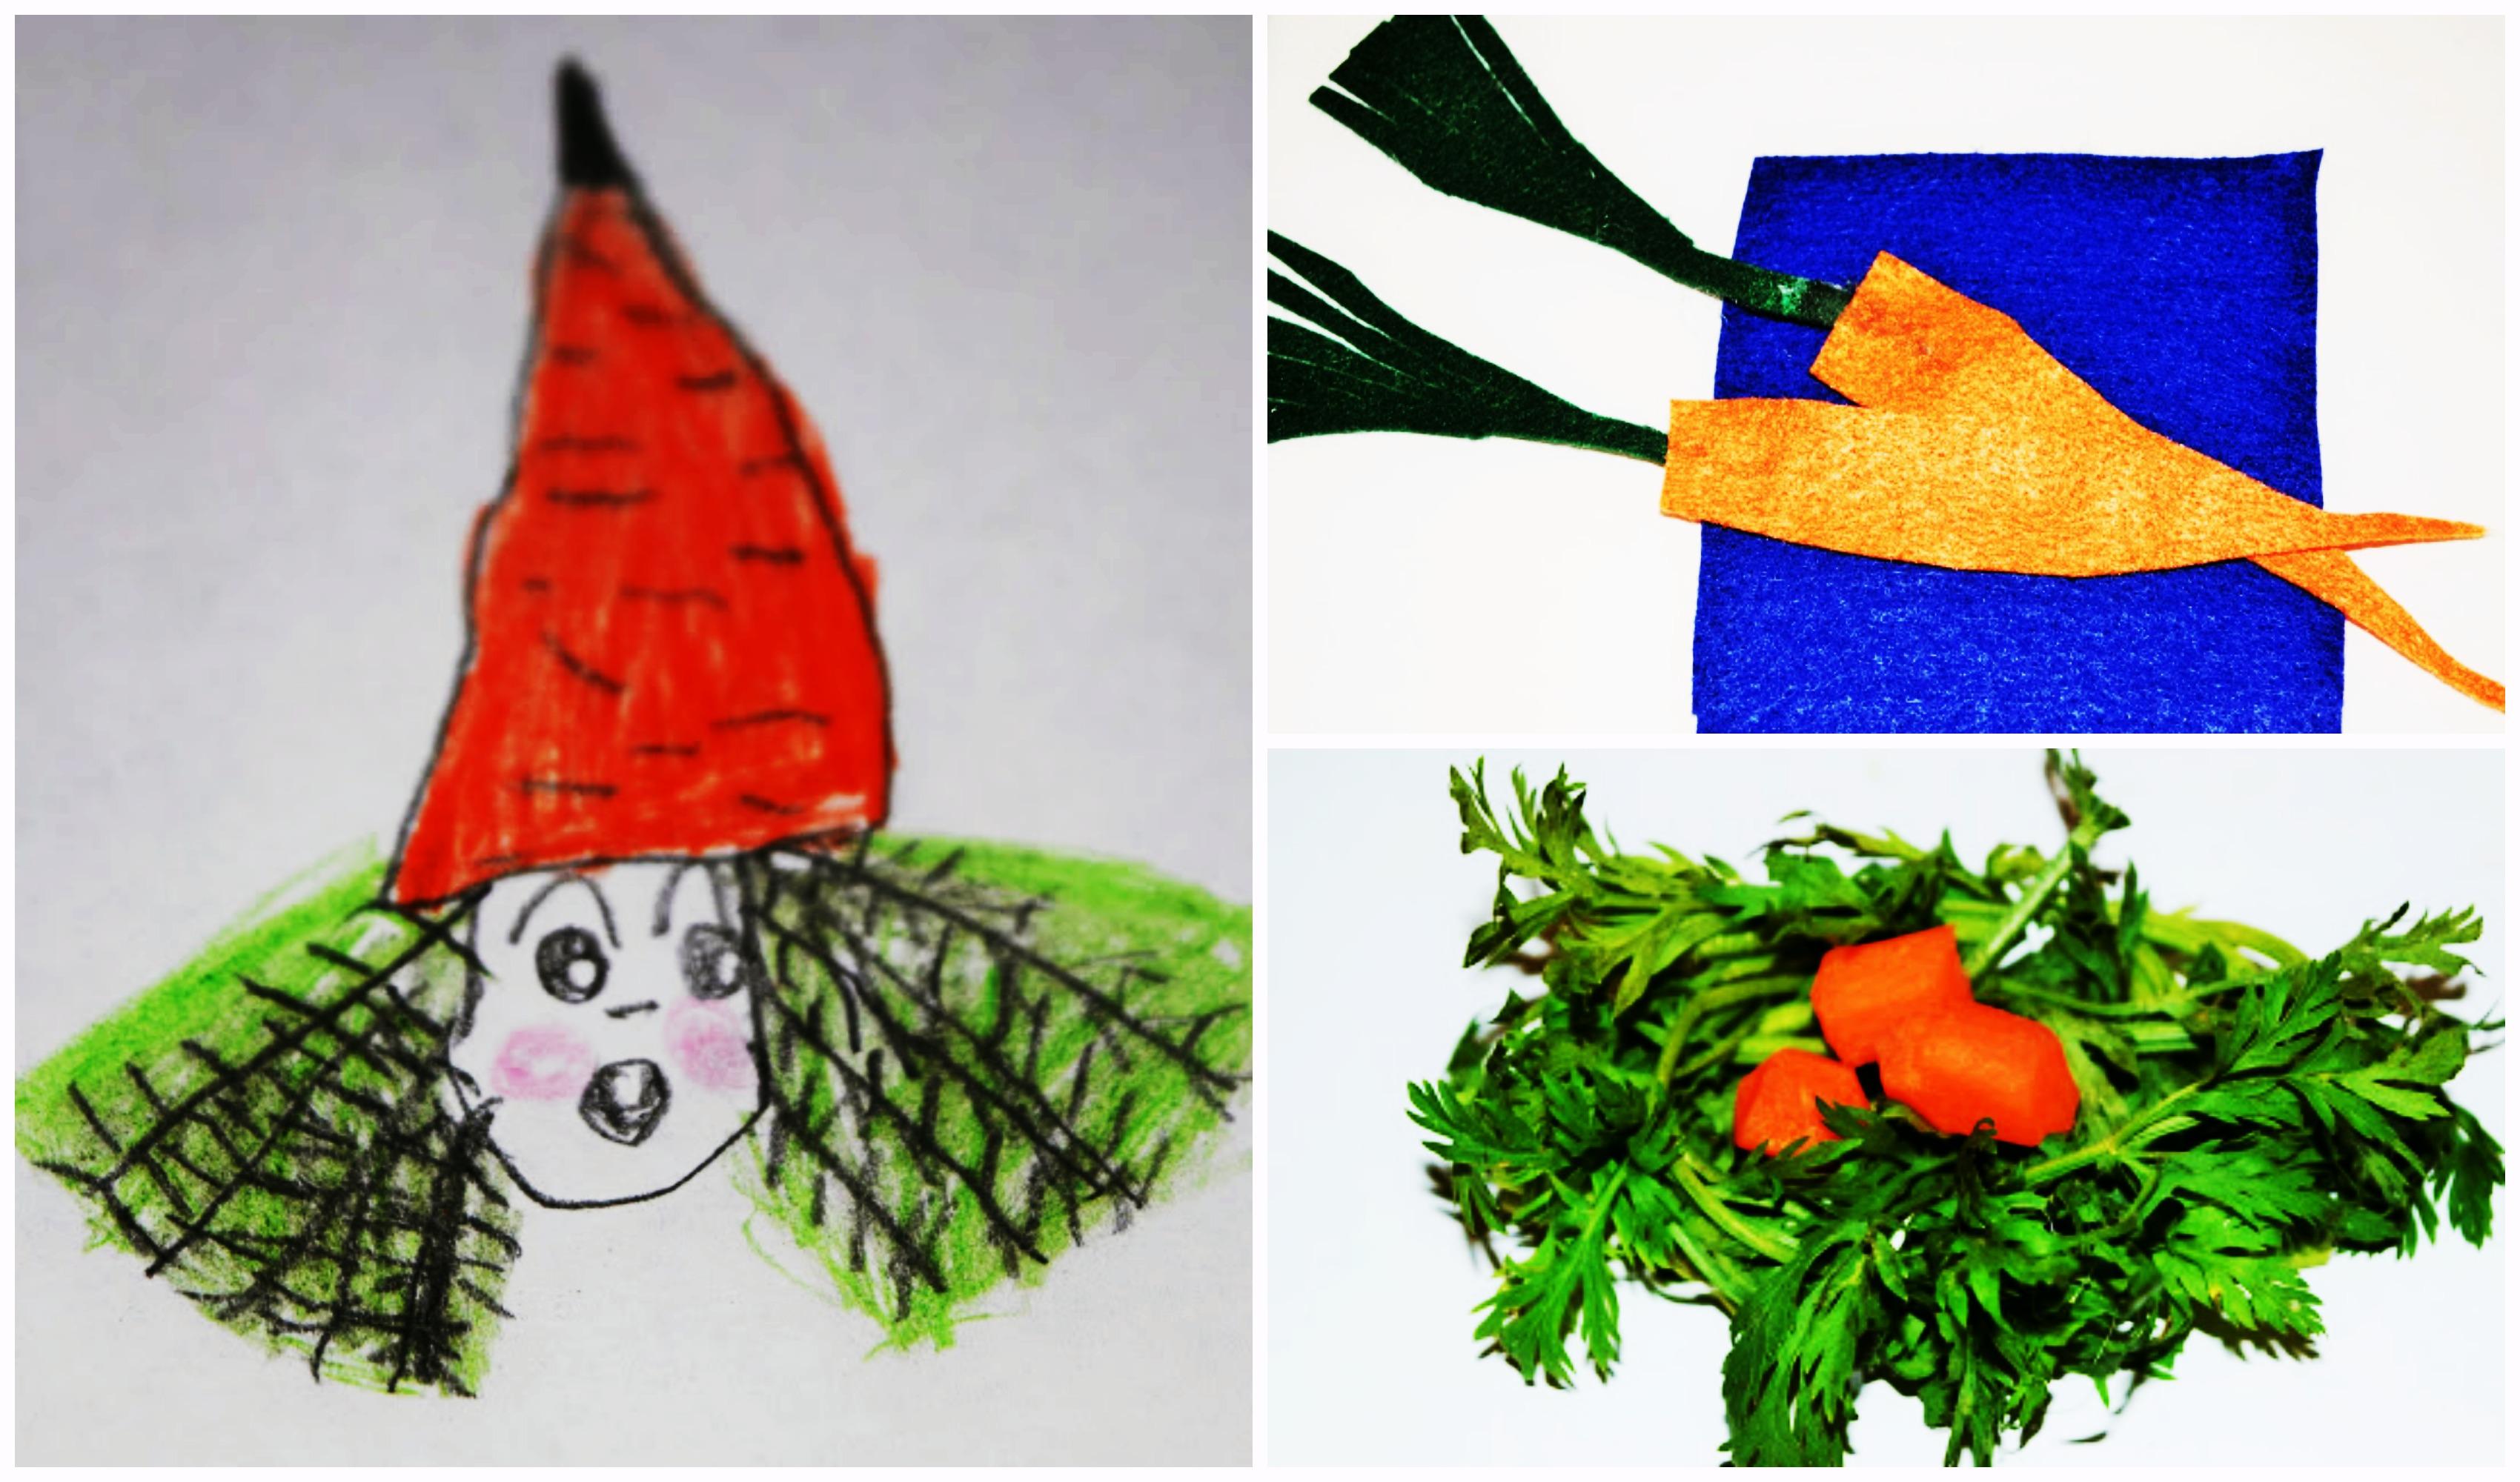 carrots-www-homegrownadventures-net